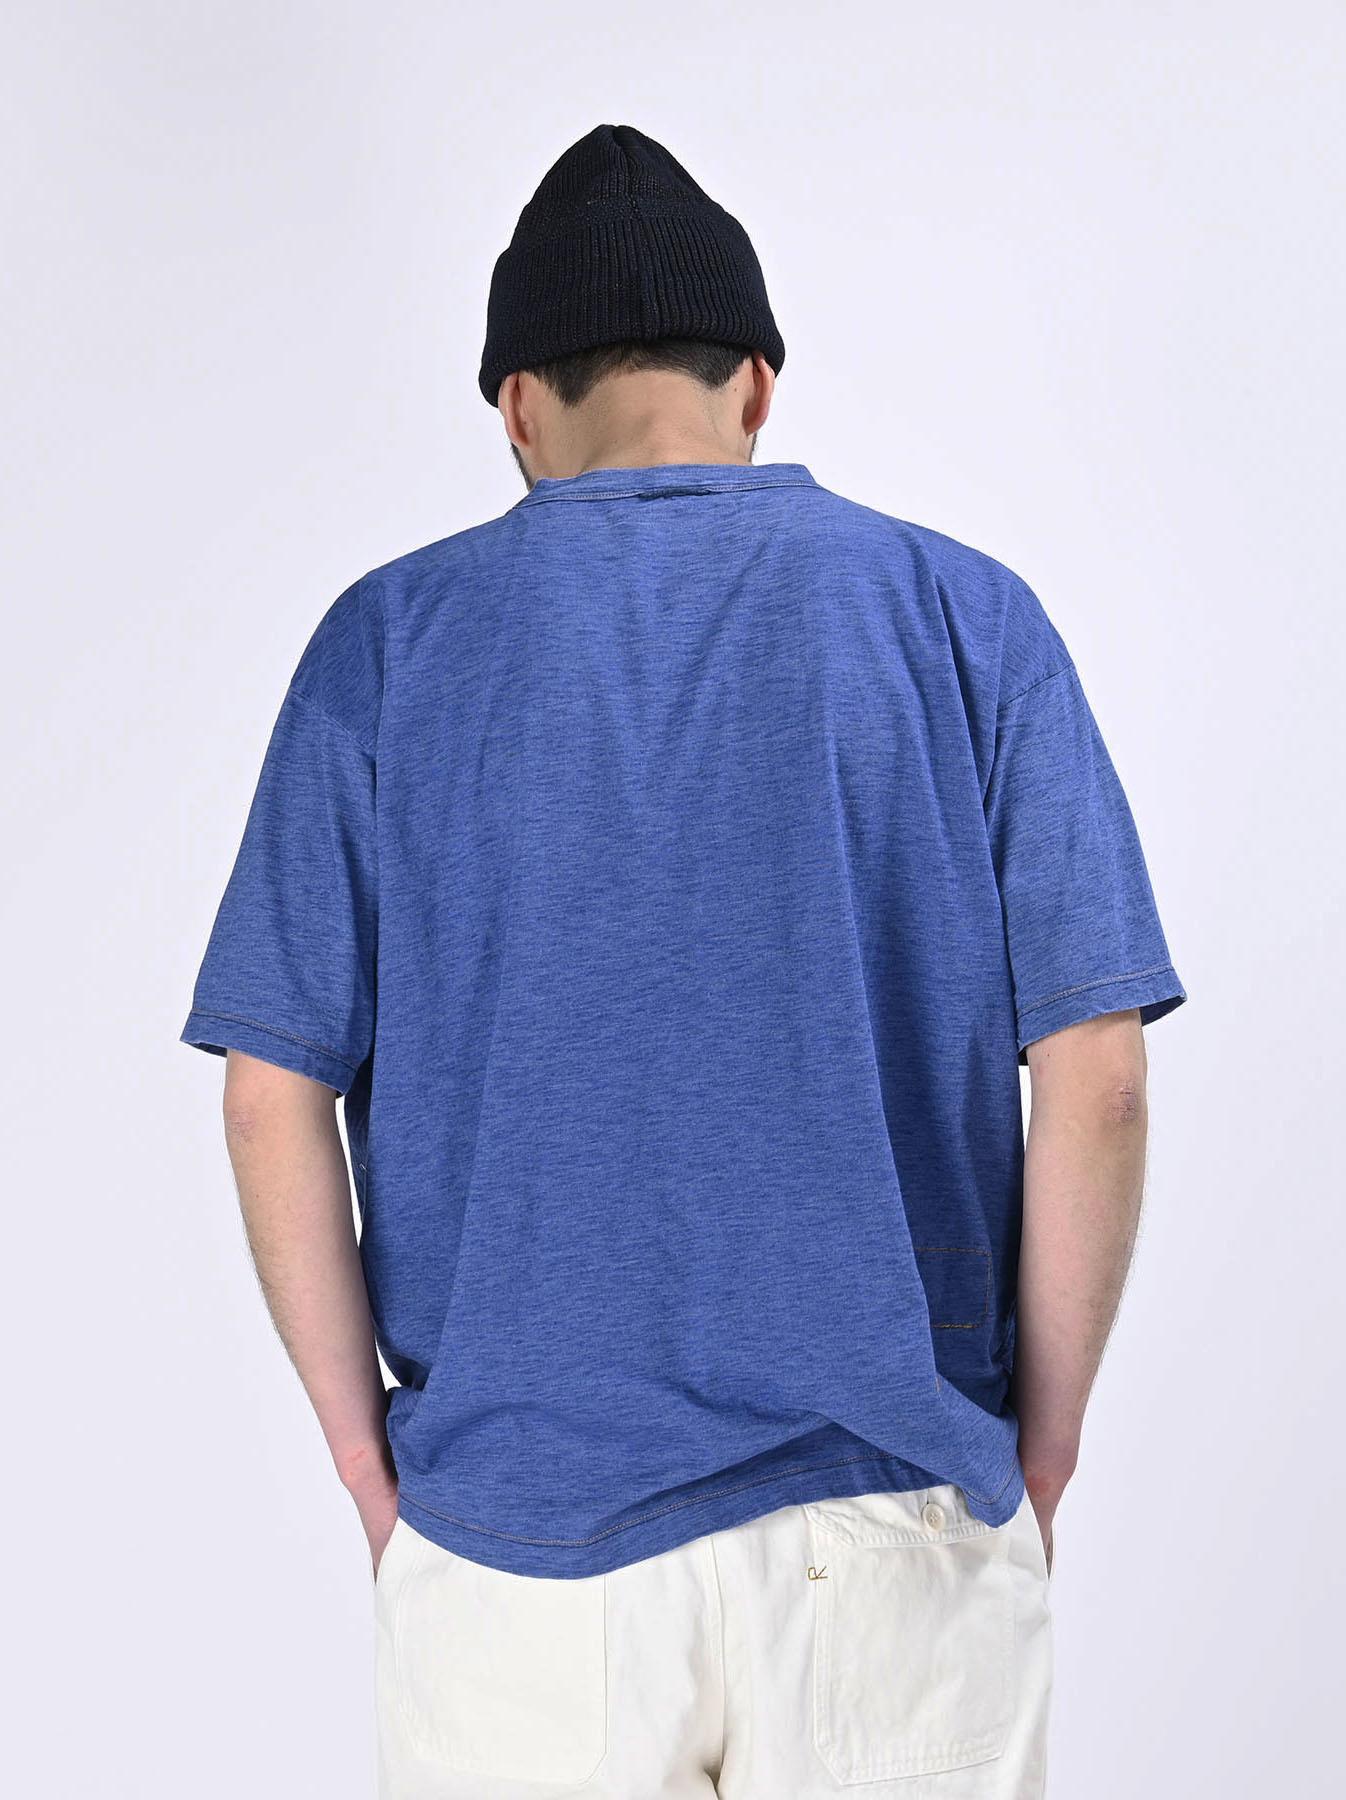 Distressed Indigo Tenjiku 908 Ocean T-Shirt (0621)-5